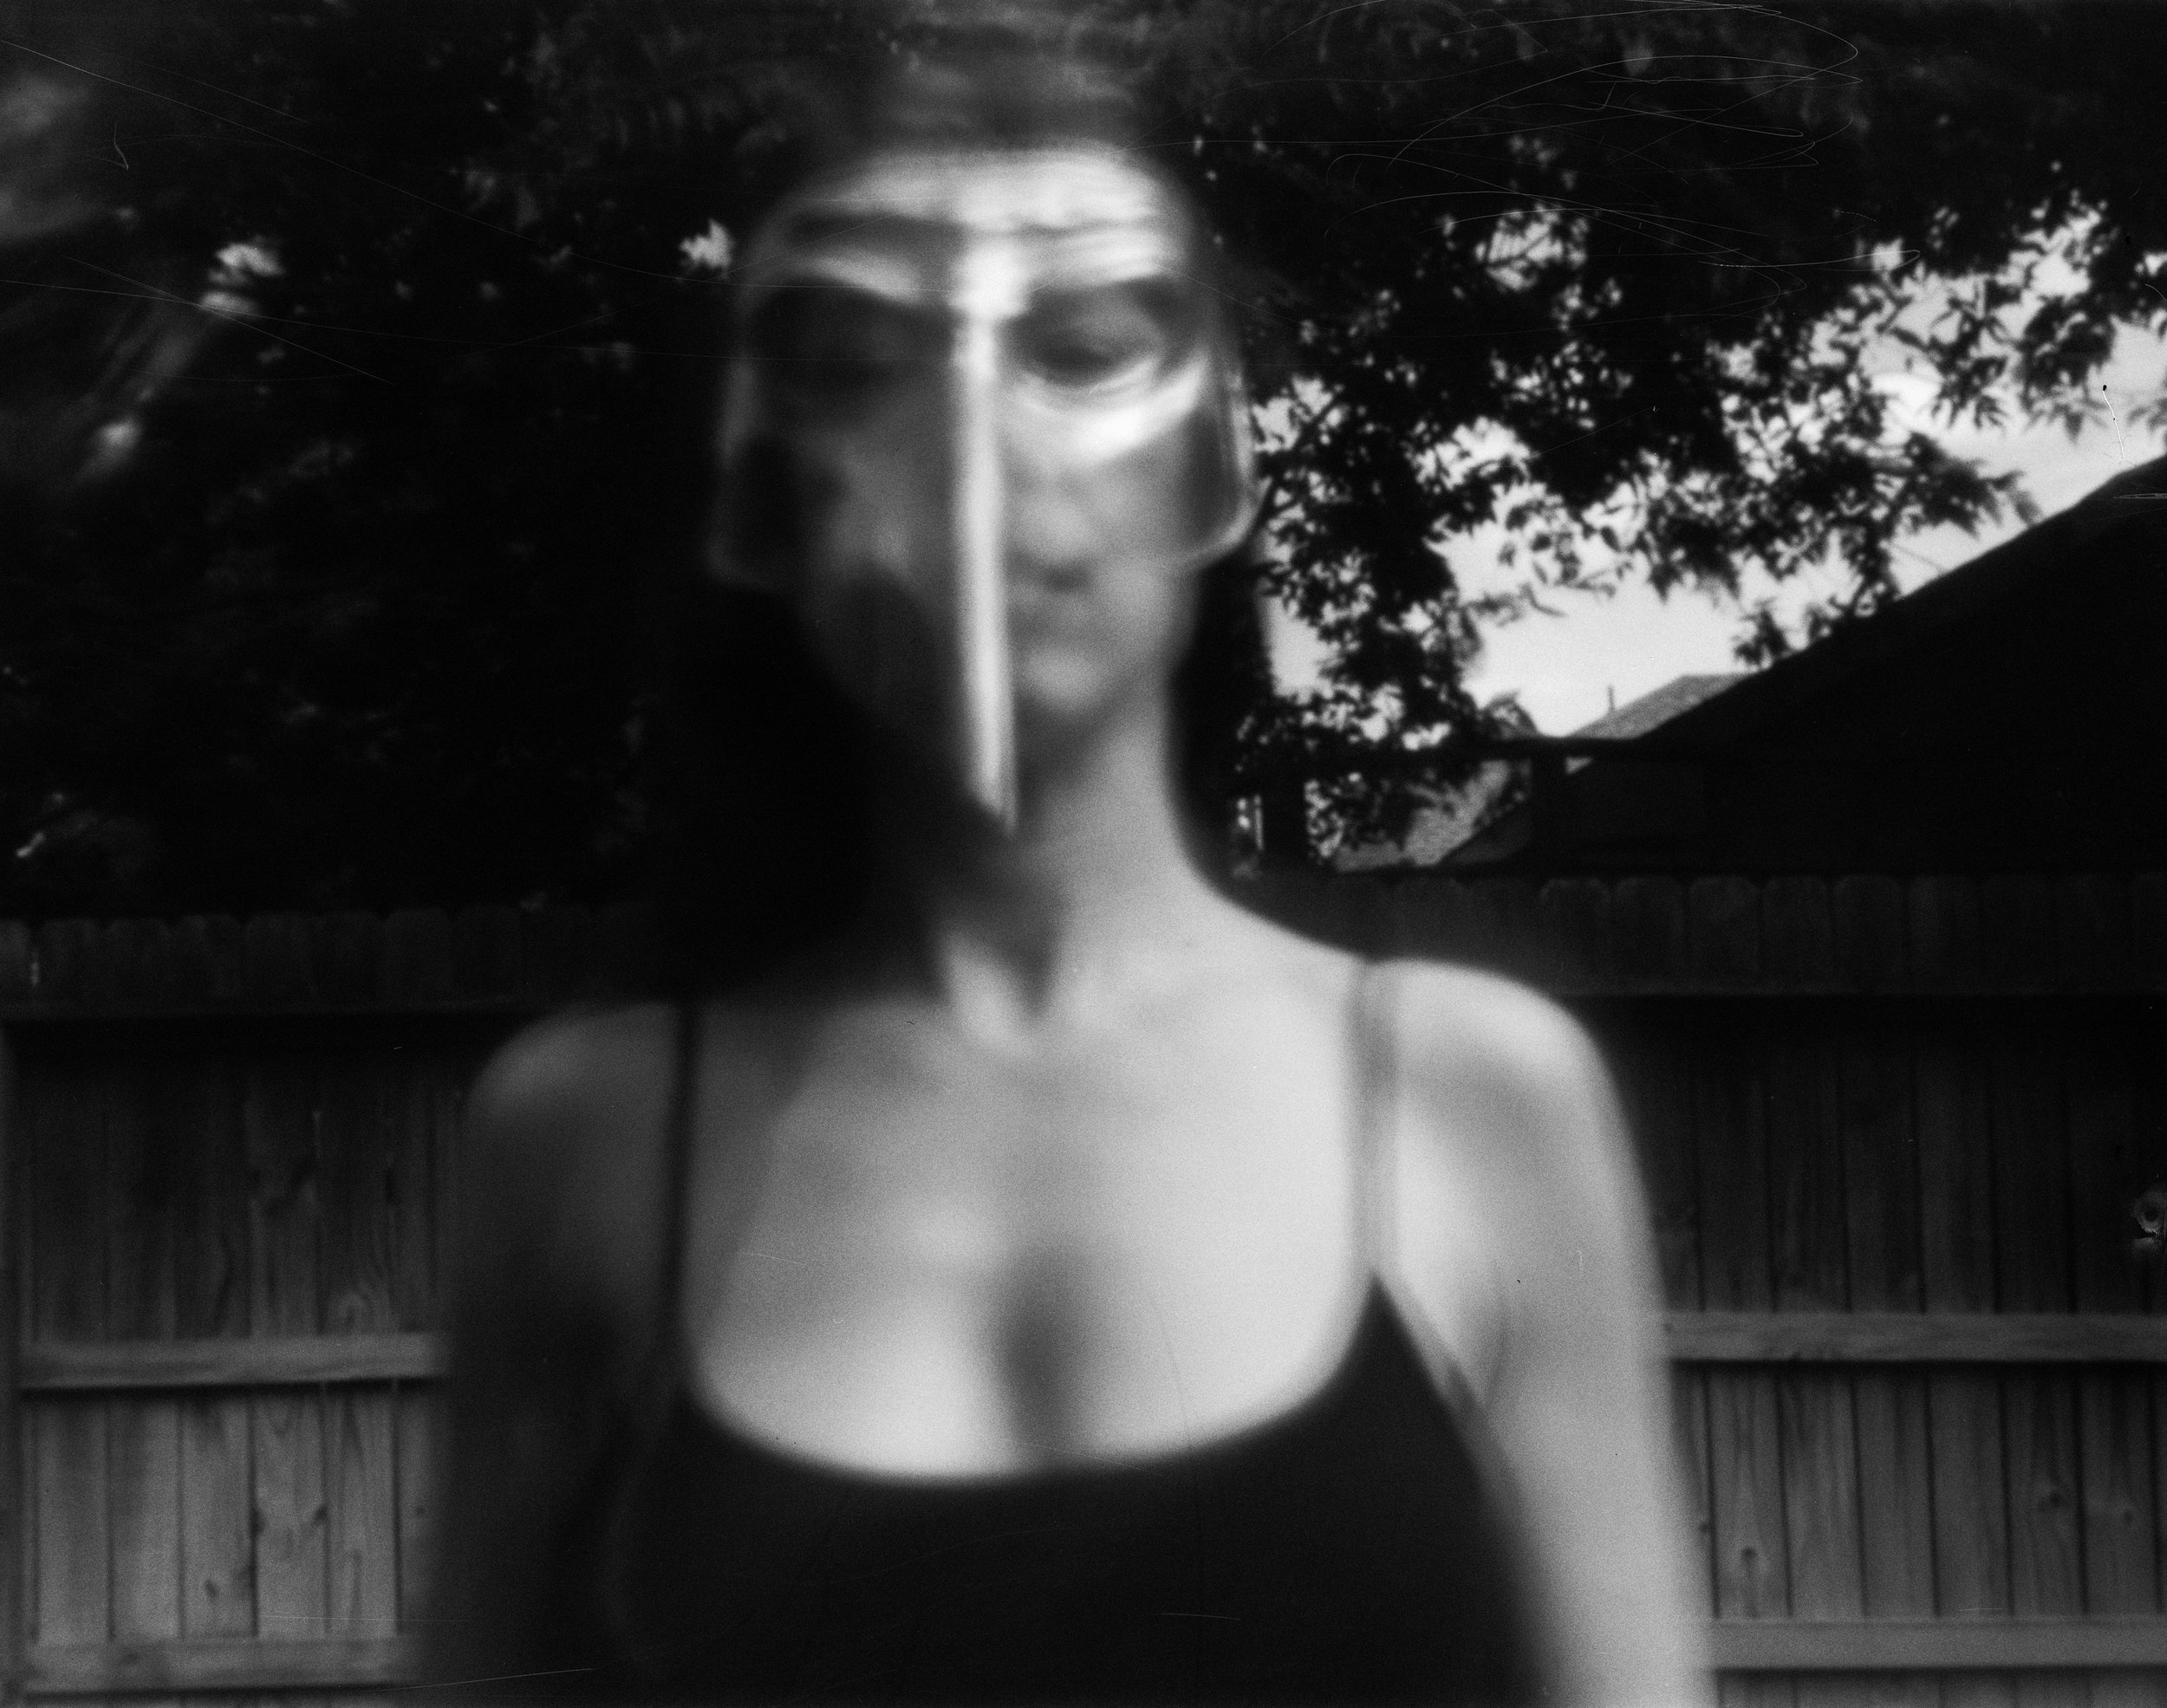 pinhole self with mask 4x5 (1 of 1).jpg